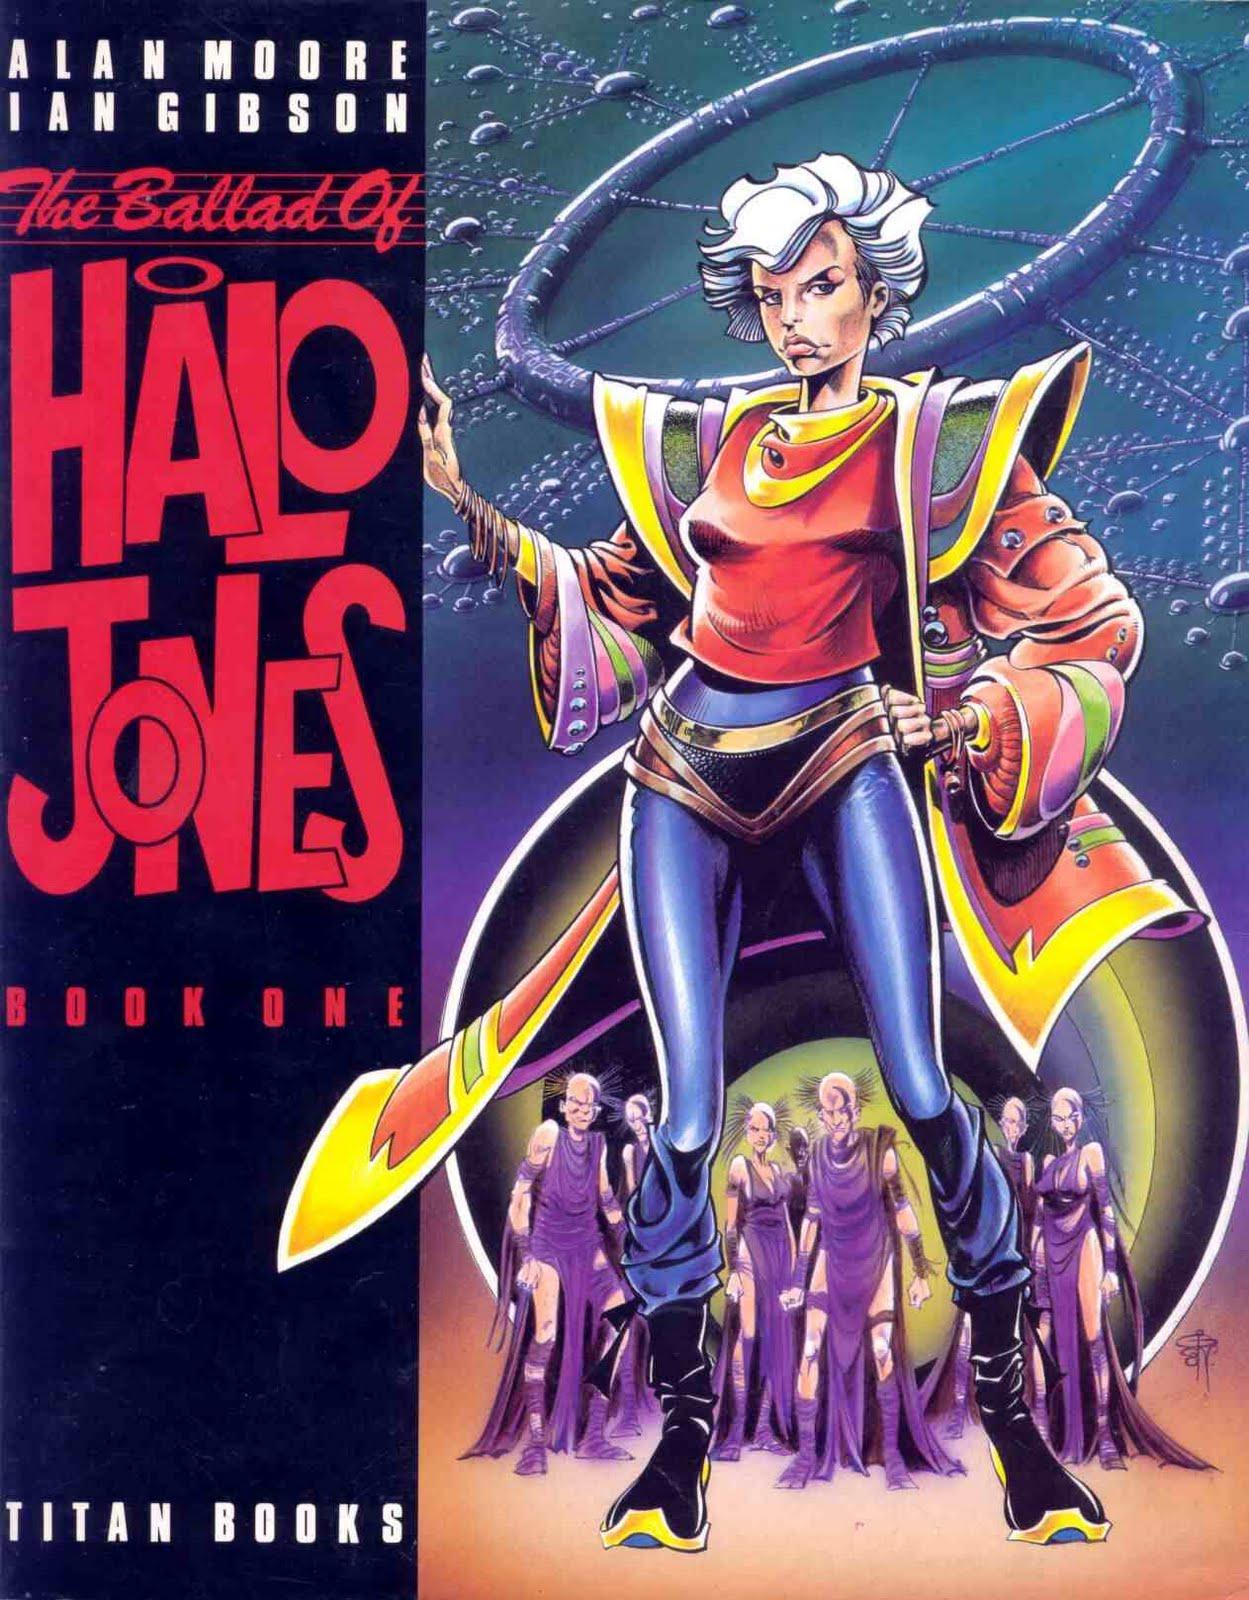 Image result for ballad halo jones